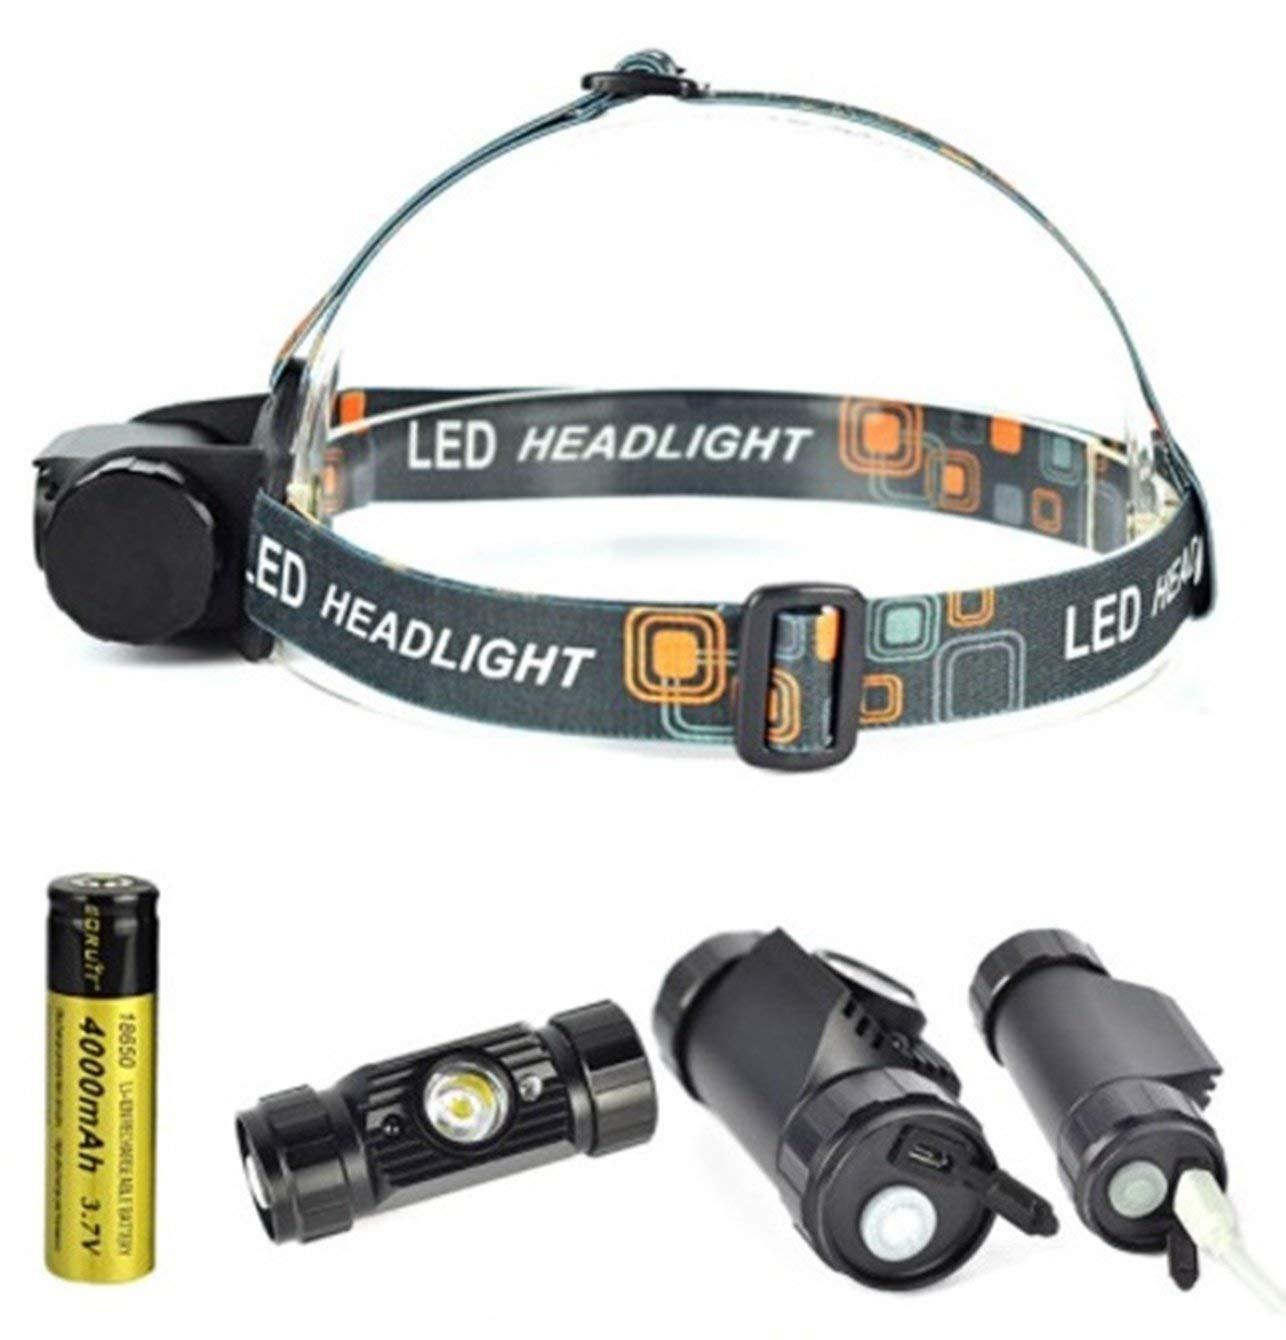 350lm Waterproof LED USB Head lamp Charge 18650 light IR Sensor Torch Flashlight